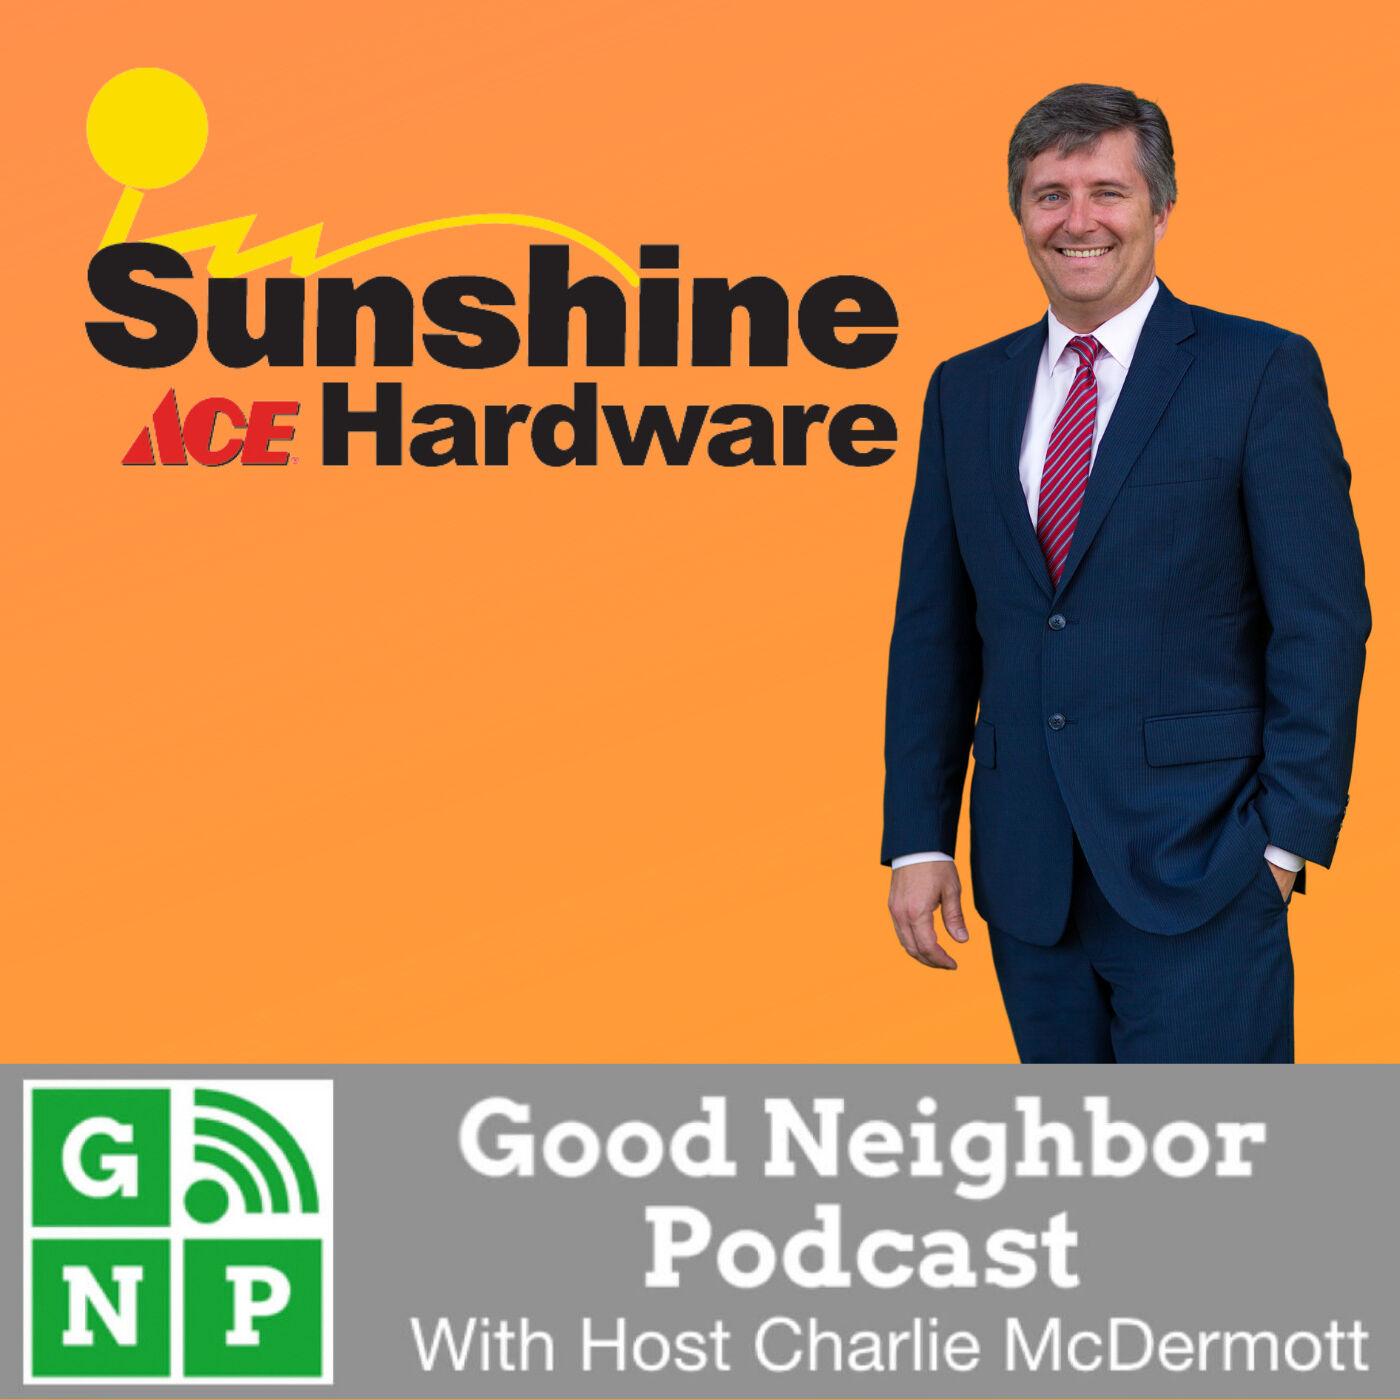 EP #447: Sunshine ACE Hardware with Michael Wynn